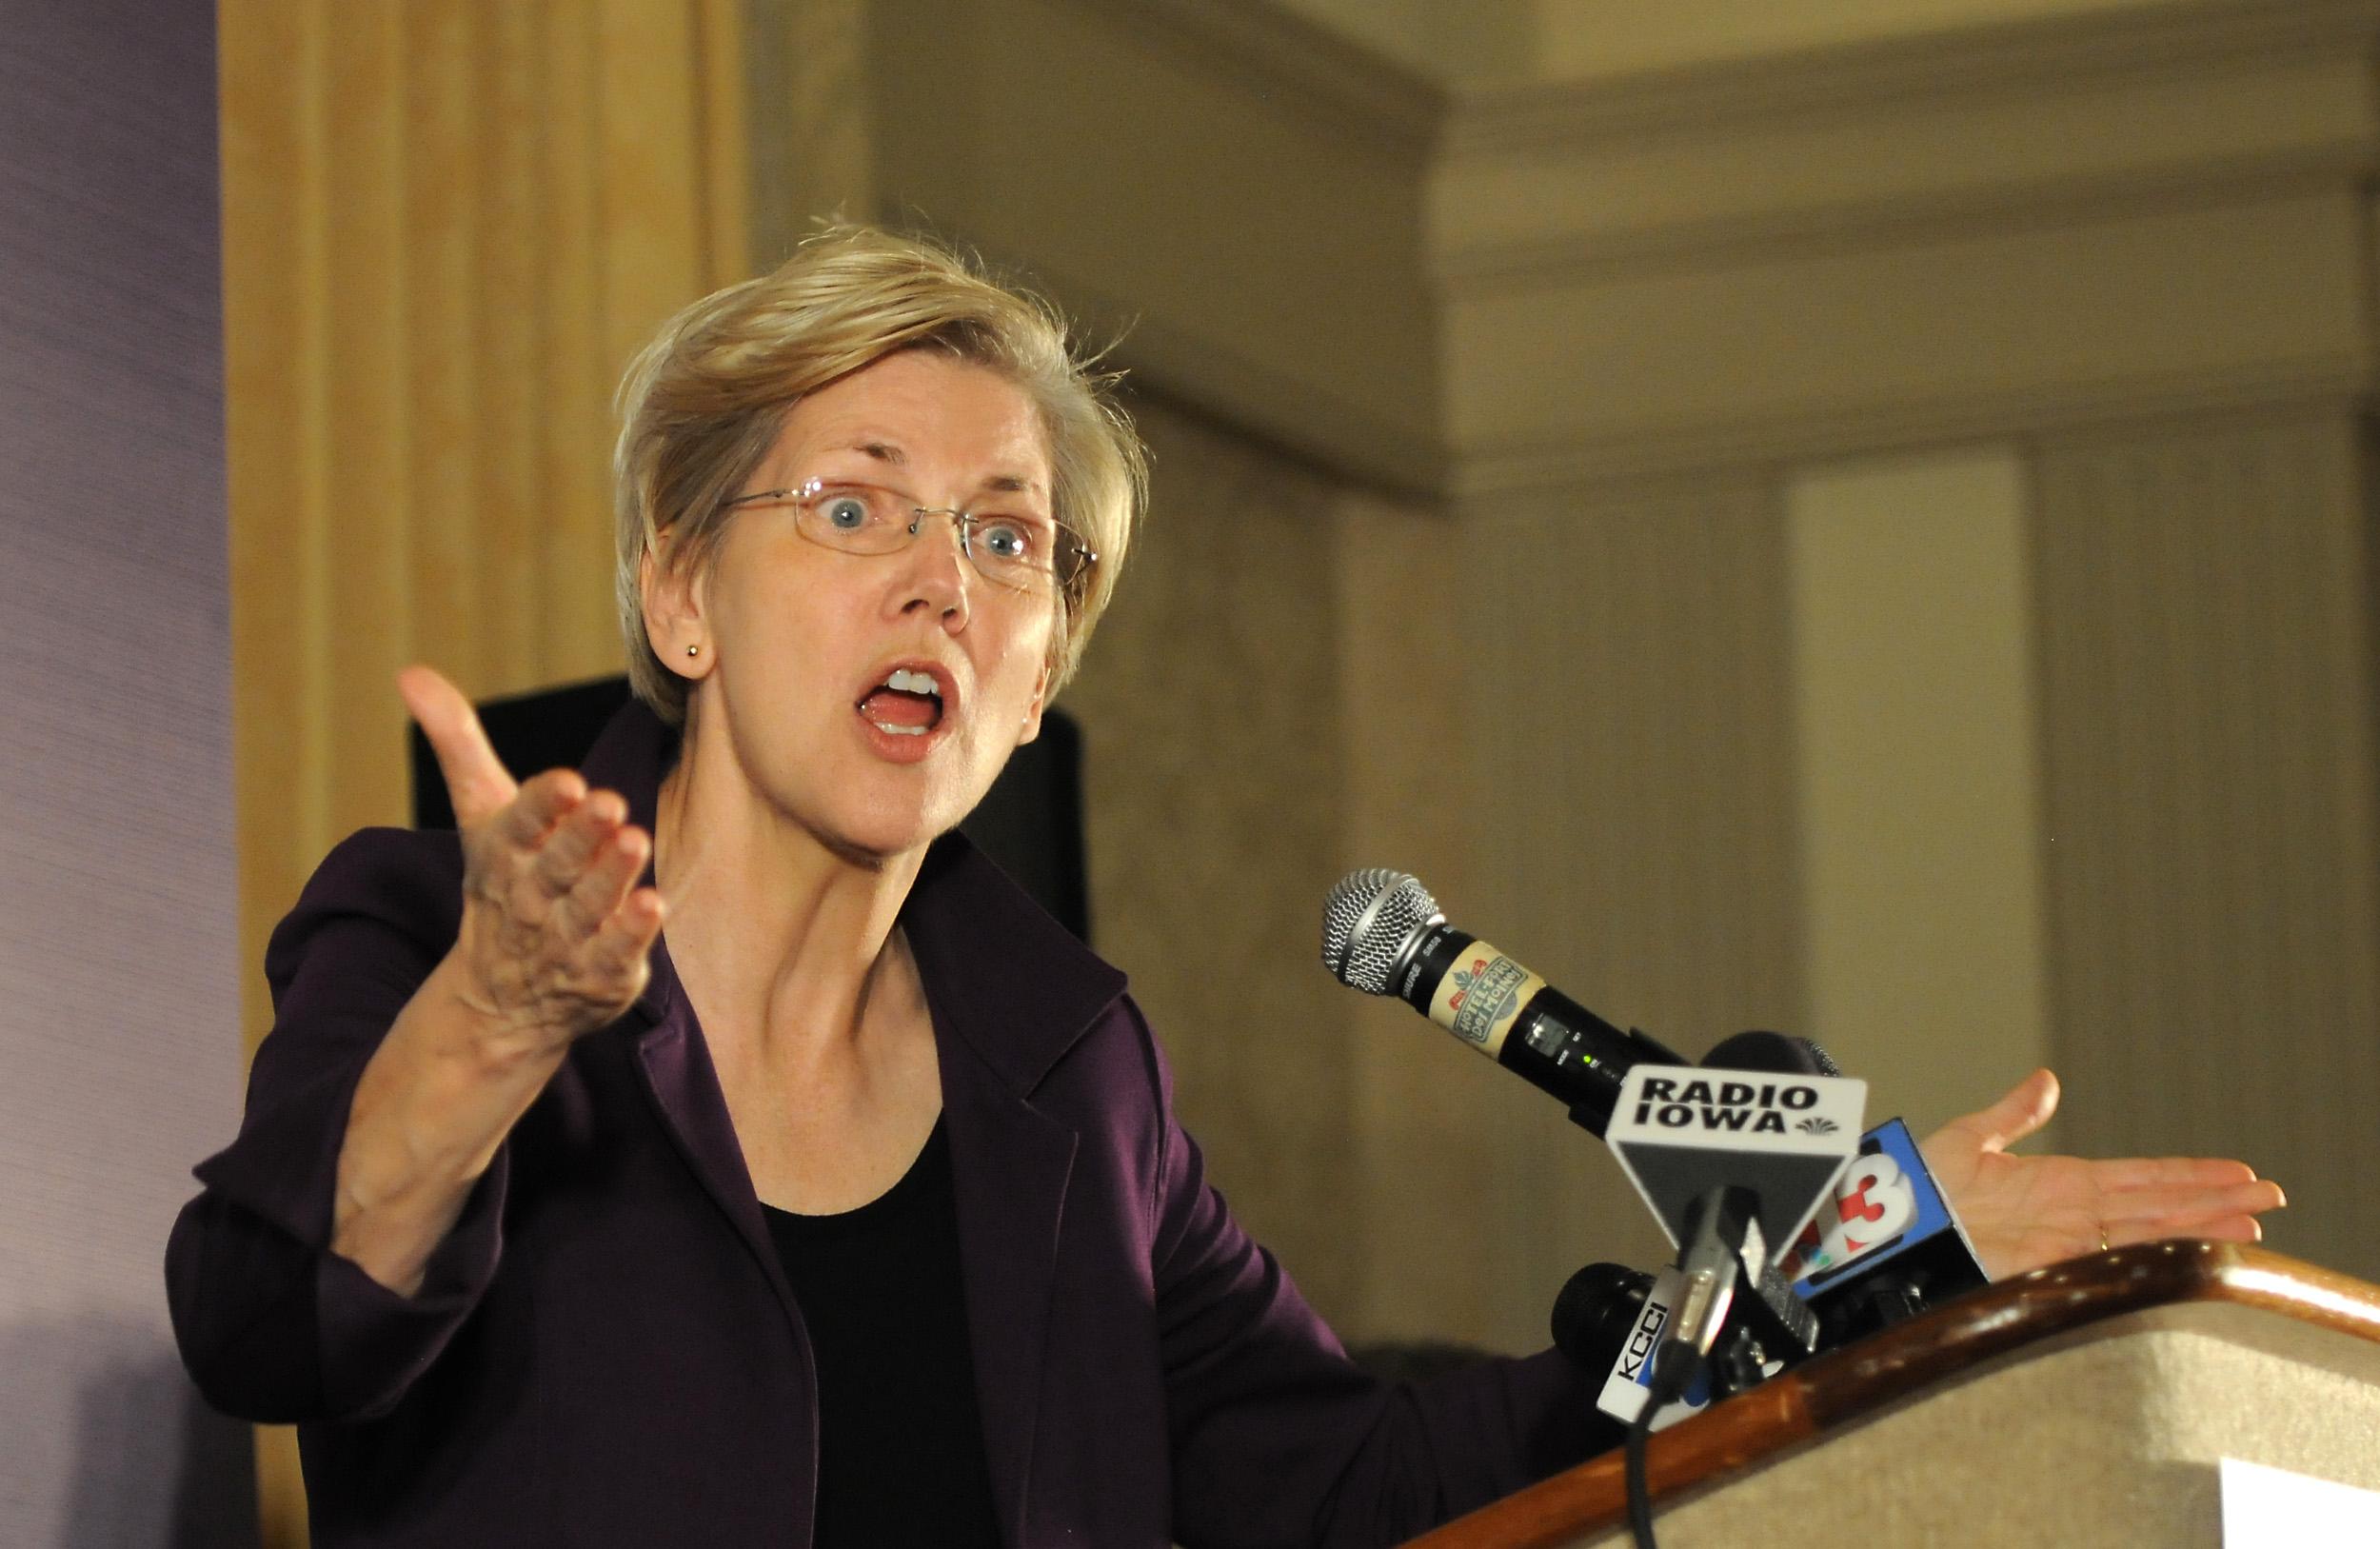 Elizabeth Warren Campaigns With Bruce Braley For His Senate Campaign Bid